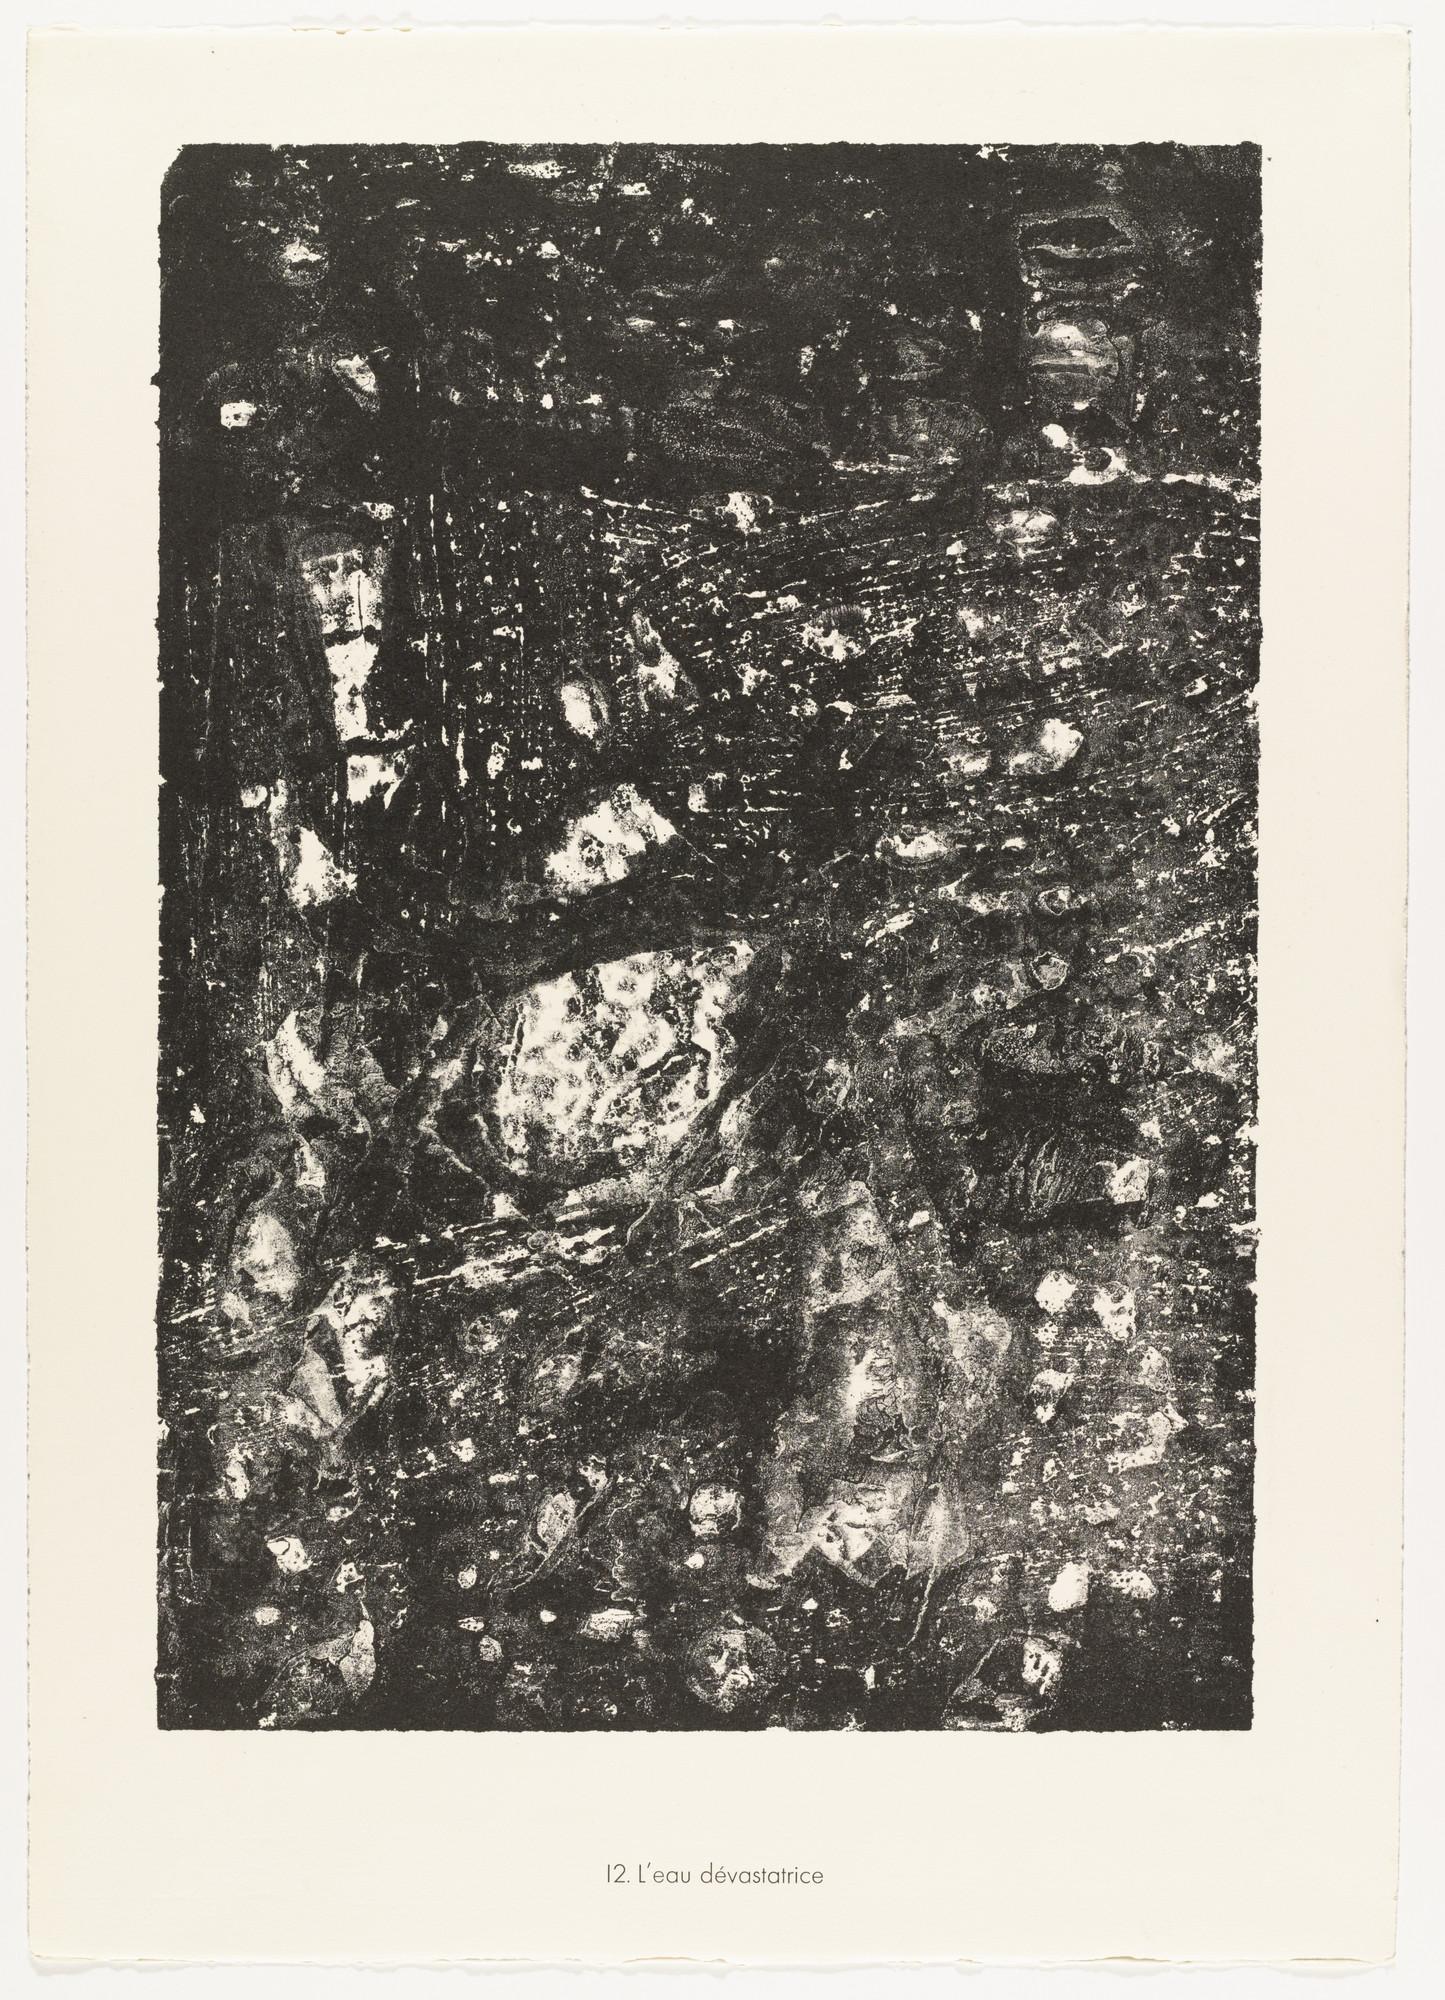 Jean Dubuffet. Devastating Water (L'eau dévastatrice) from the portfolio Waters, Stones, Sand (Eaux, Pierres, Sable) from Phenomena (Les Phénomènes). 1959